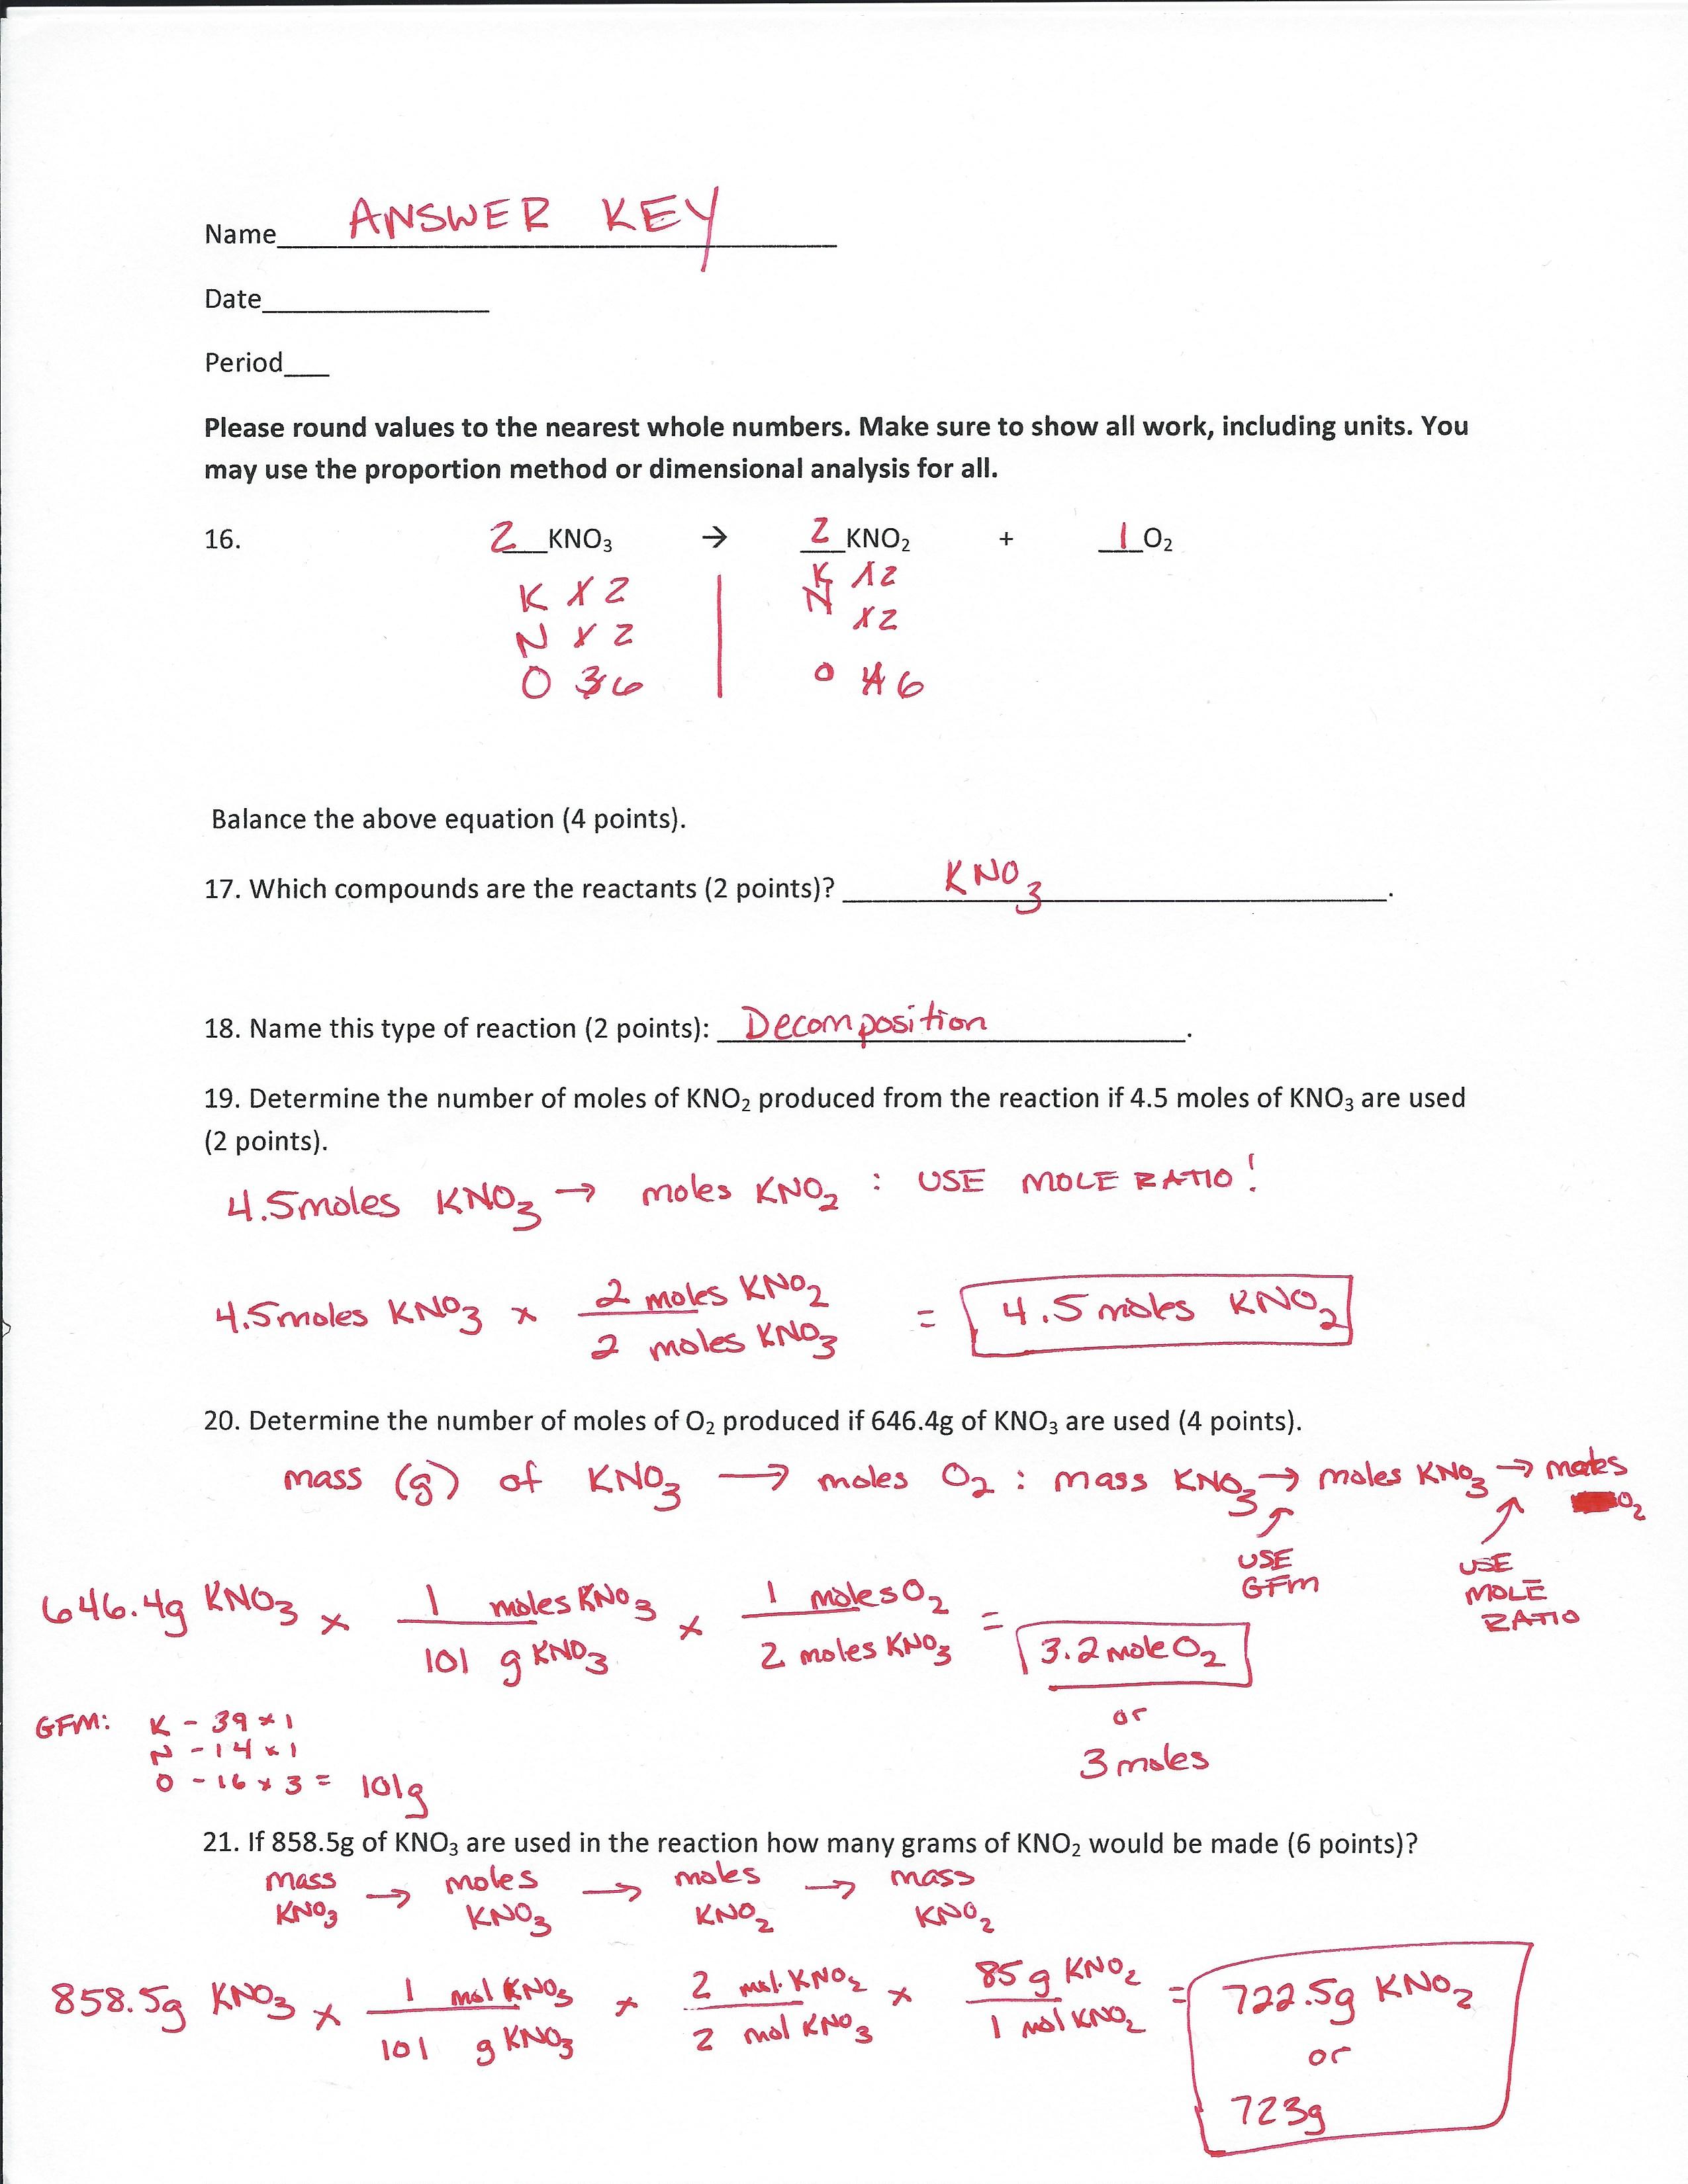 worksheet Heating Curve Worksheet Answers sfp heating curves worksheet answers printable blog www sfponline org uploads 335